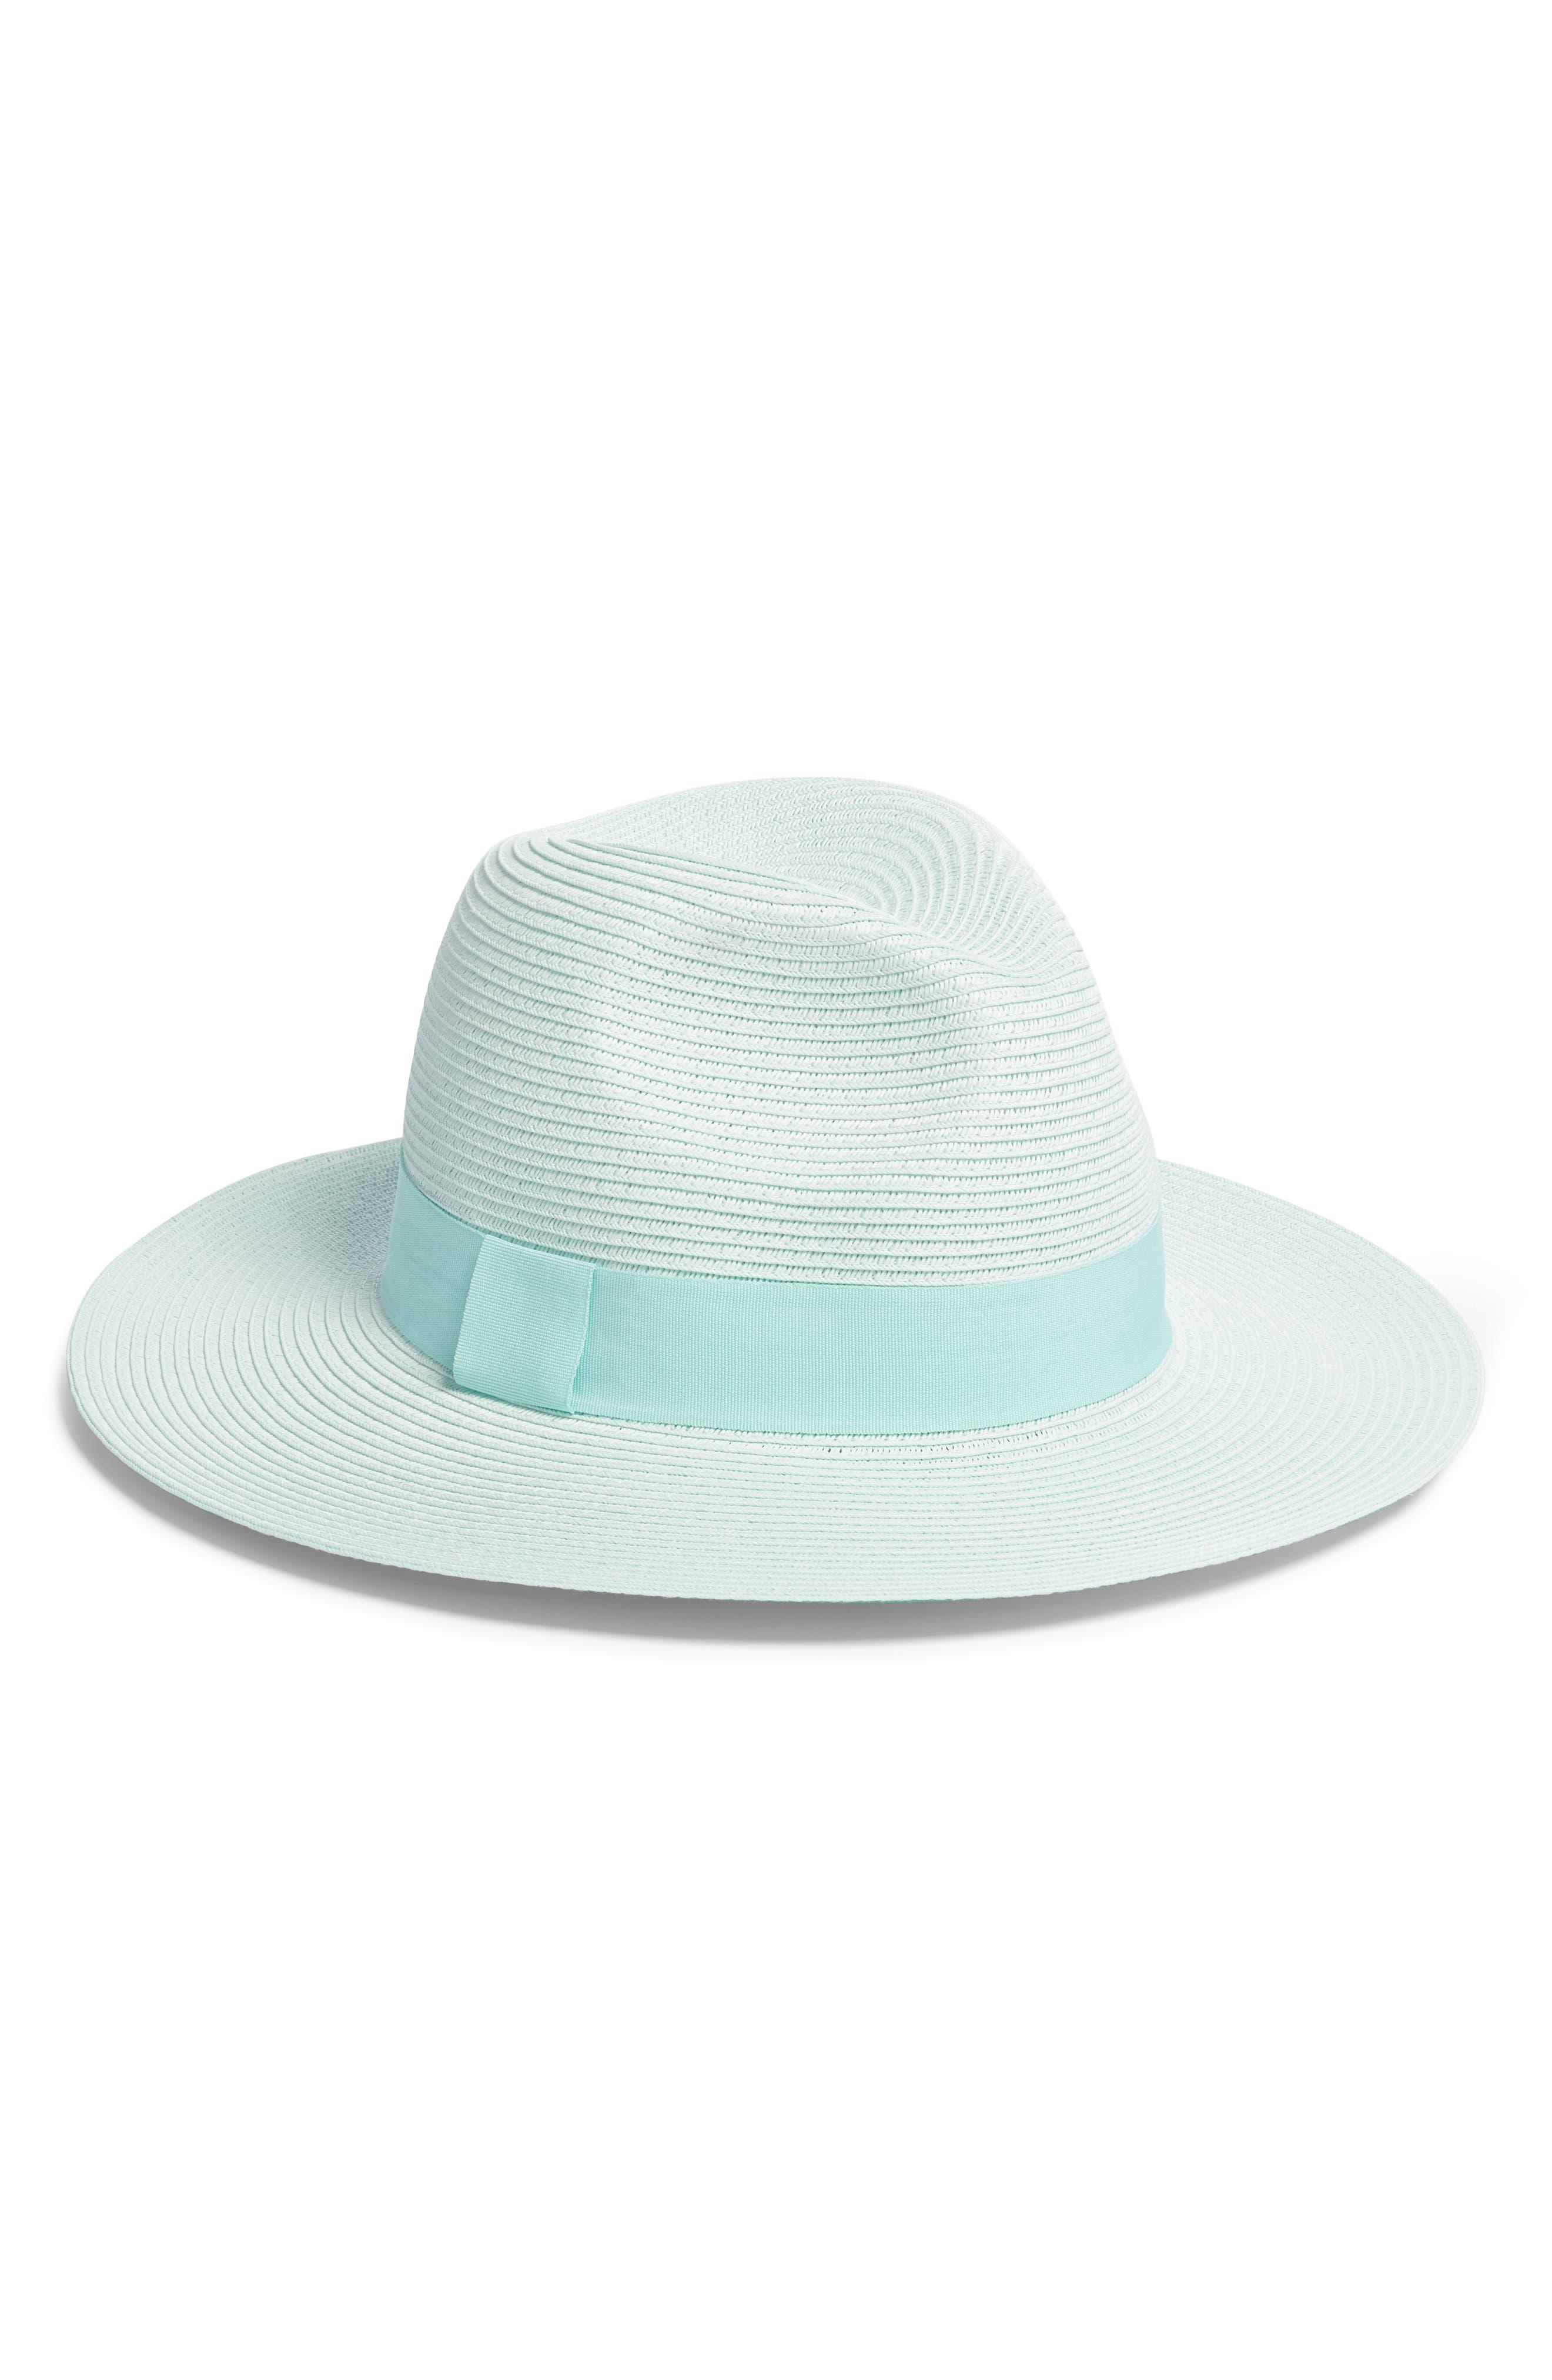 SOMETHING NAVY Woven Panama Hat, Main, color, GREEN AQUA